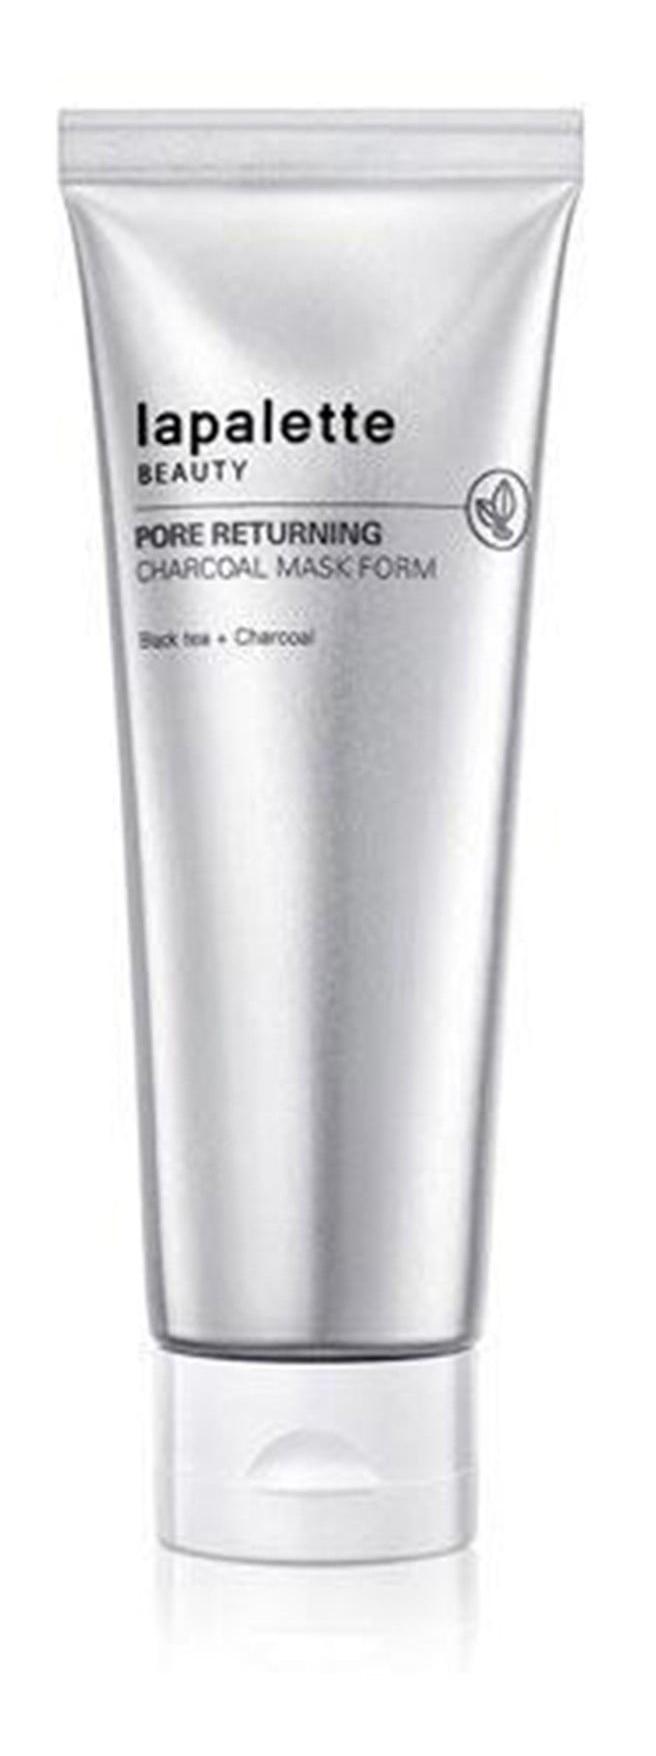 Lapalette Beauty Pore Returning Charcoal Mask Foam